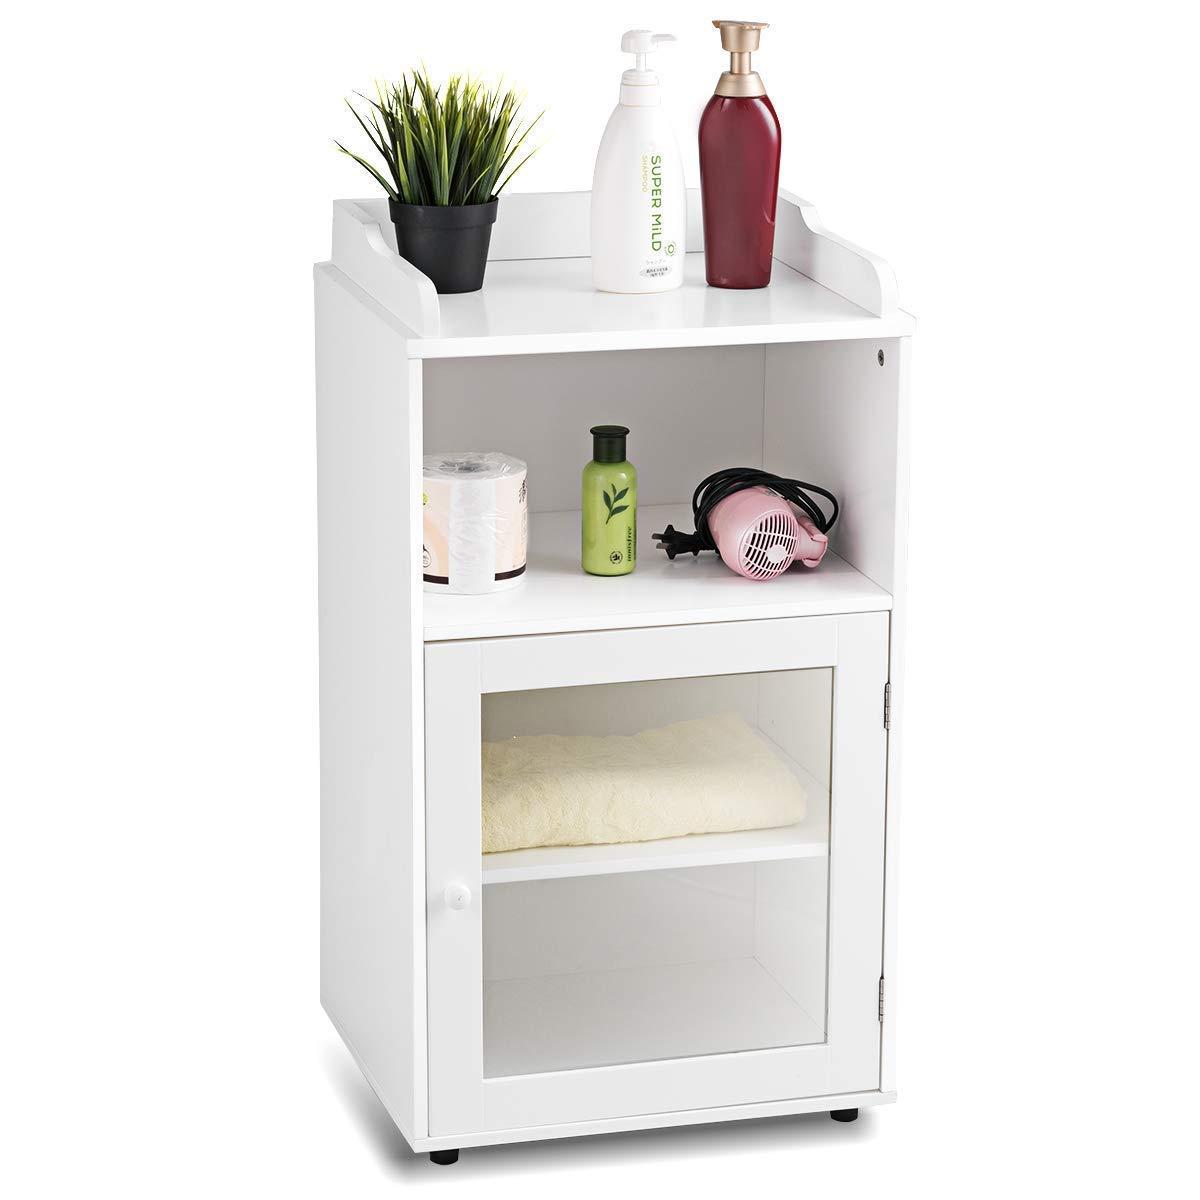 Tangkula Bathroom Floor Cabinet, Wooden Storage Cabinet for Home Office Living Room Bathroom, W/Tempered Glass Door Adjustable Shelf Organizer, White